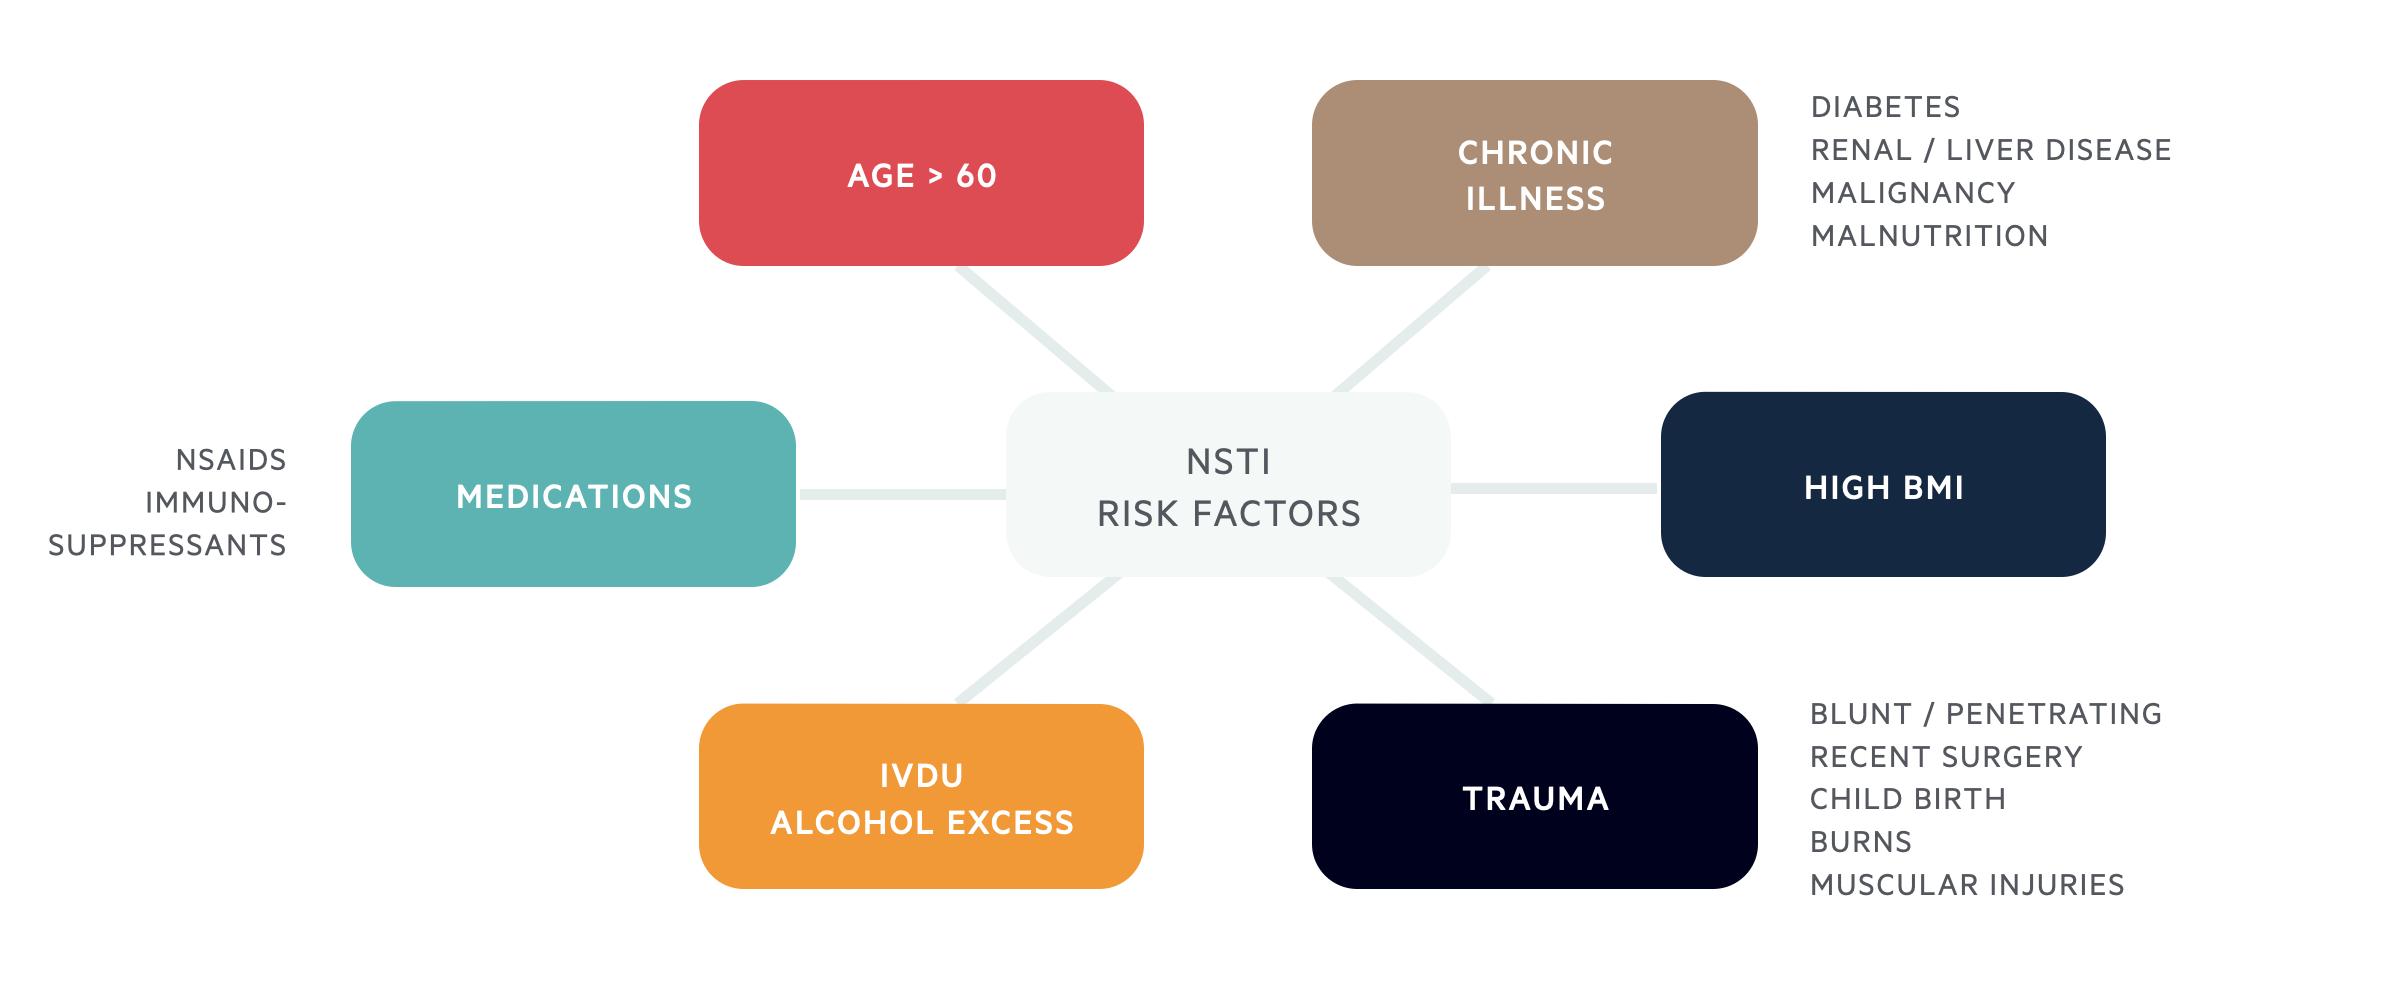 NSTI risk factors